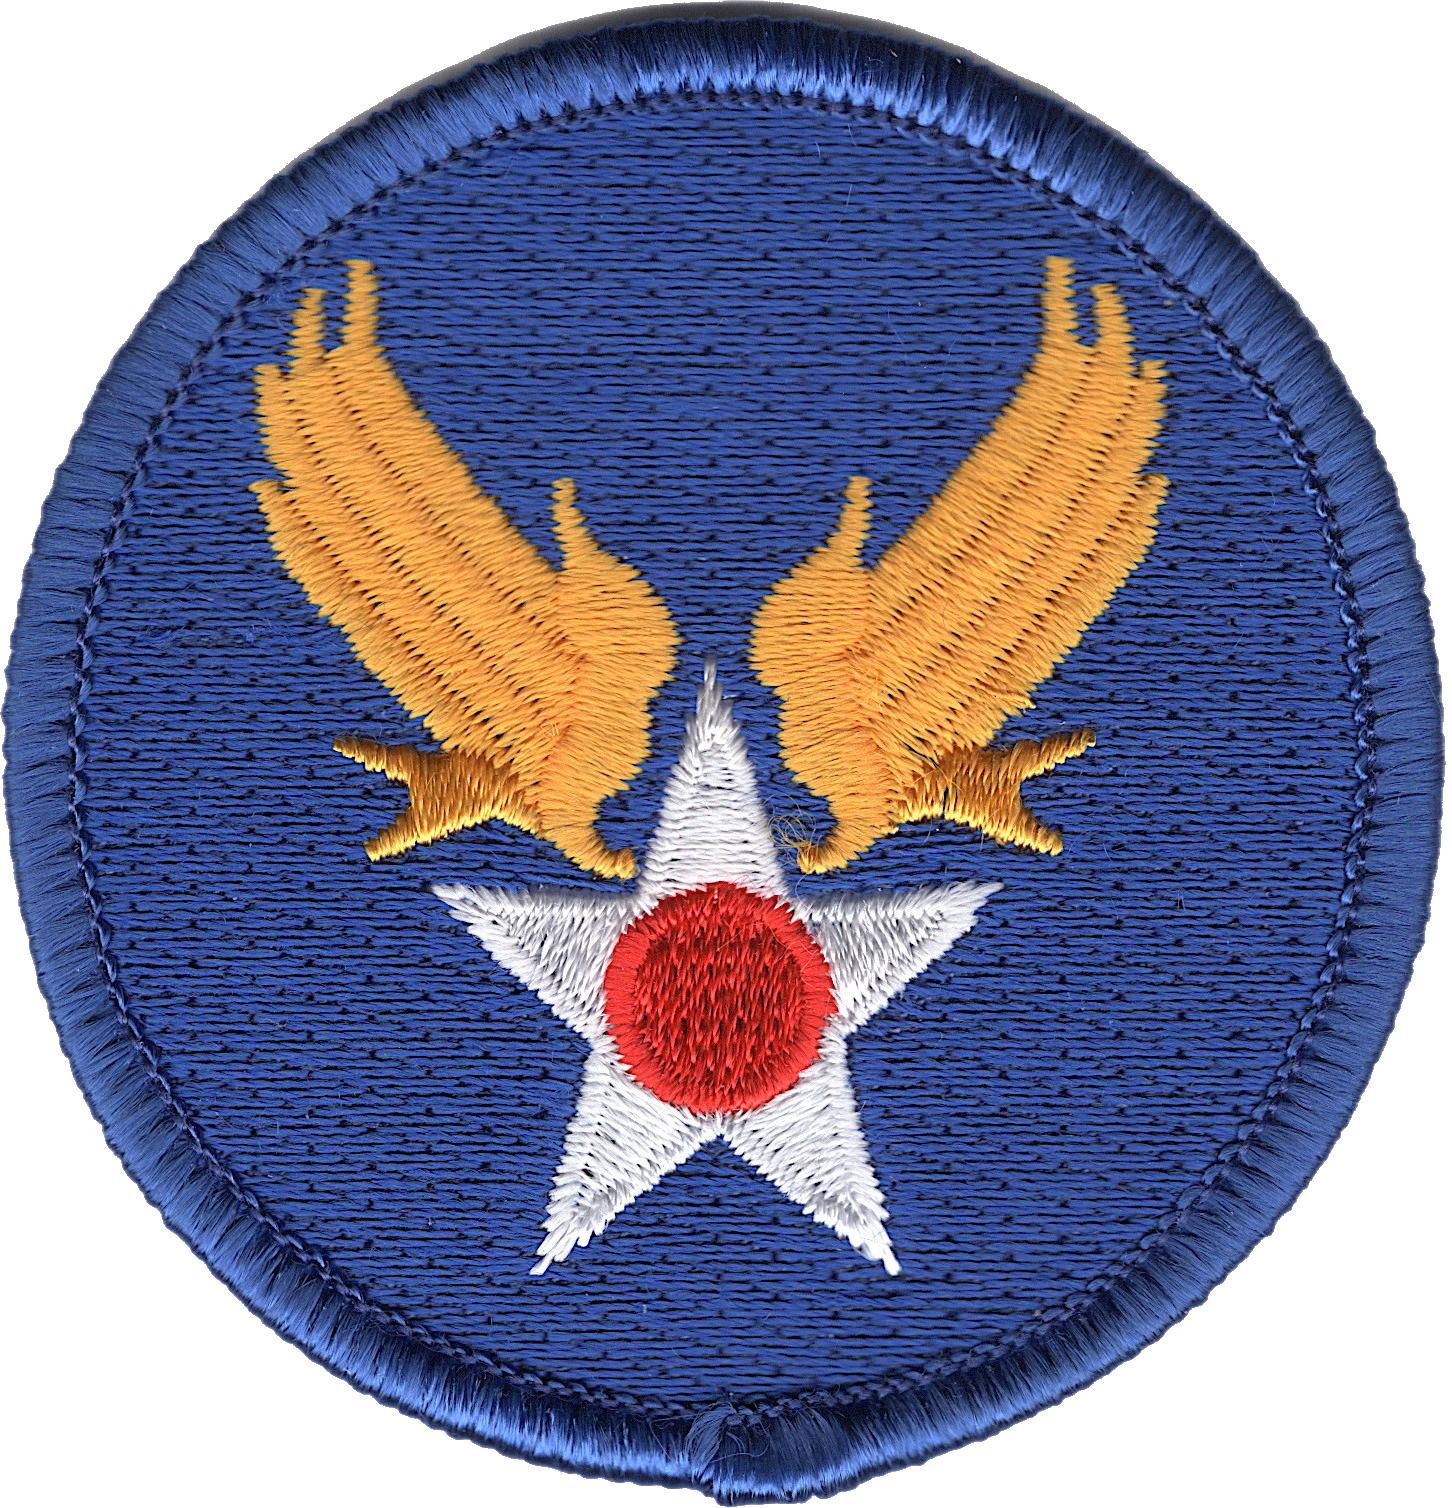 US Army Air Force (USAAF)